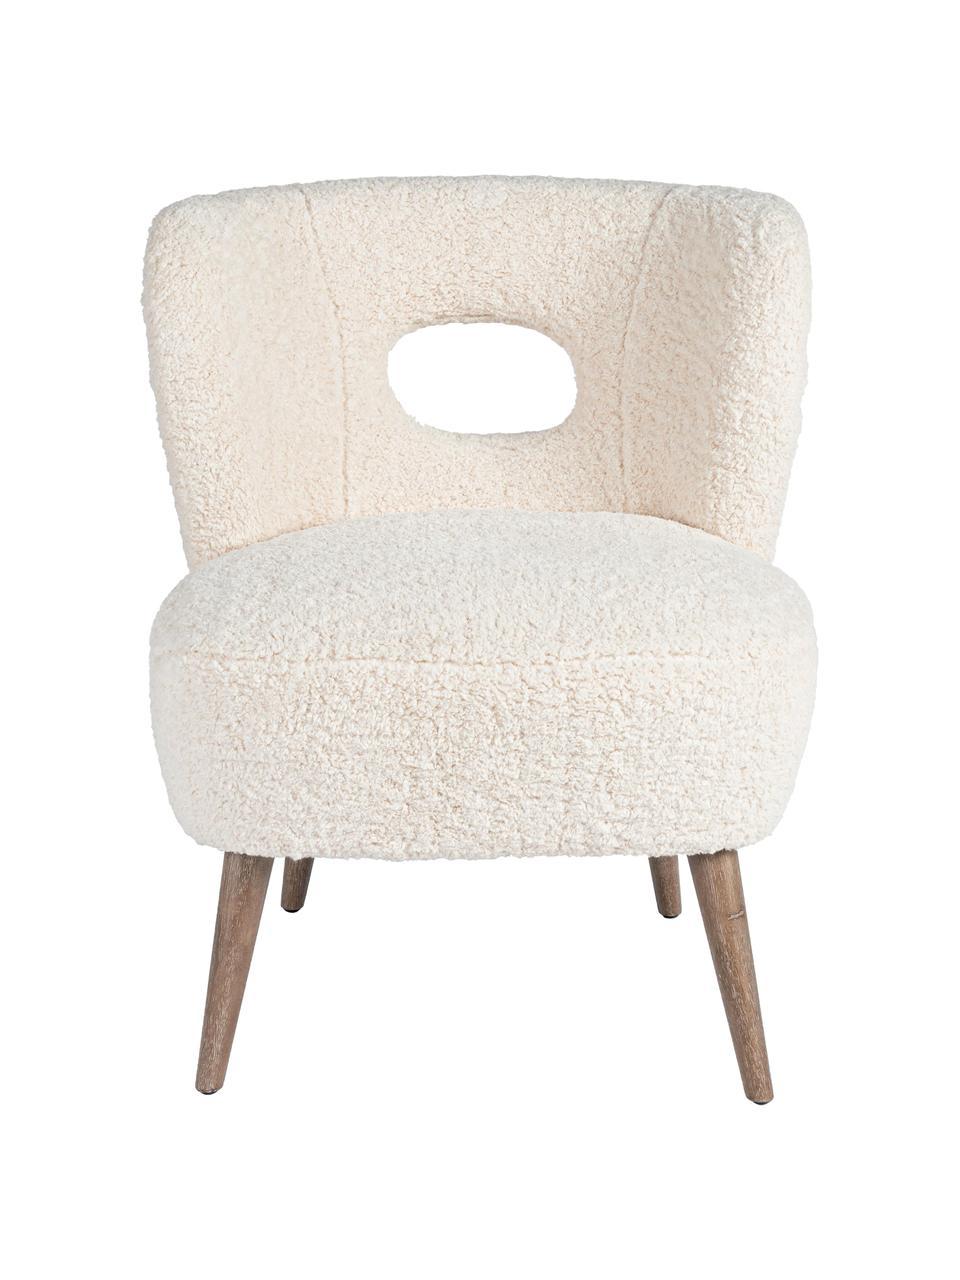 Teddy loungefauteuil Cortina, Zitvlak: polyester, Frame: dennenhout, Poten: rubberhout, Crèmekleurig, 65 x 68 cm